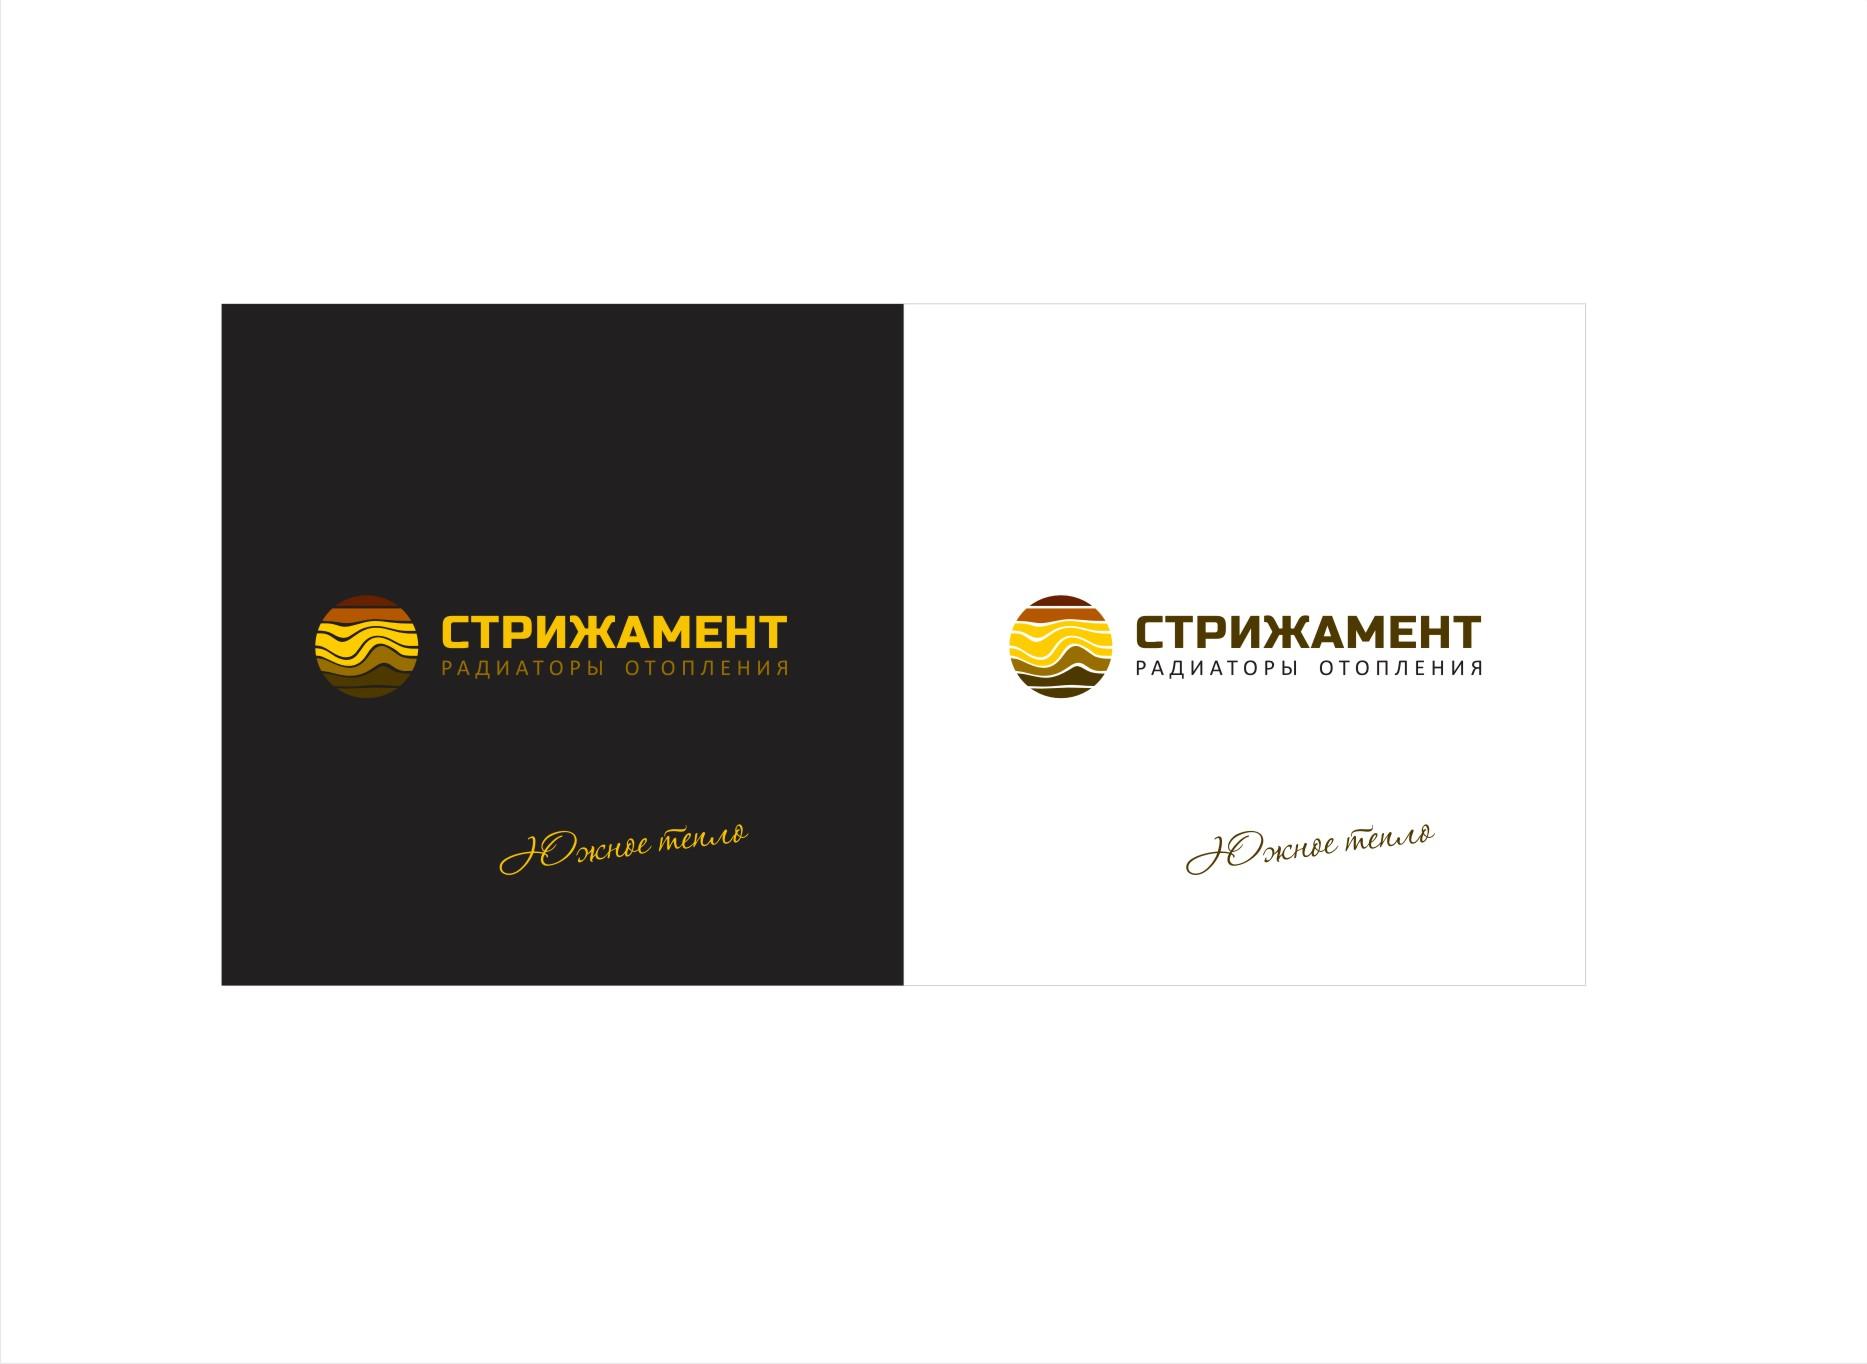 Дизайн лого бренда фото f_0675d4dc25234d85.jpg